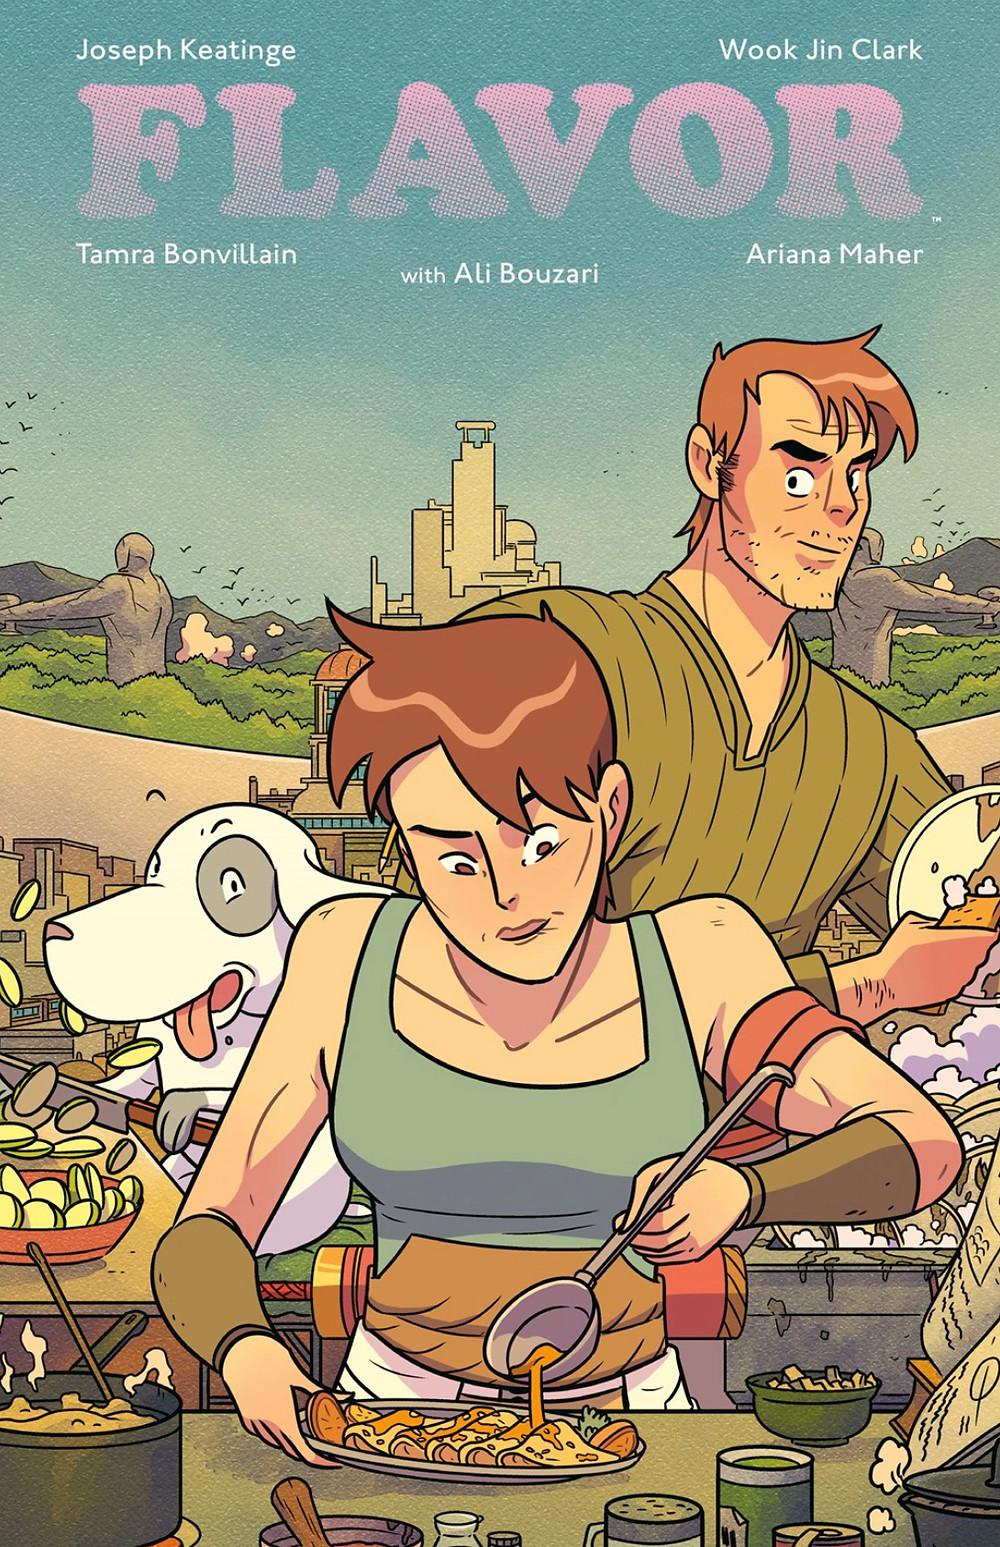 Flavor, Vol. 1 (tpb), cover, Image Comics, Keatinge/Jin Clark